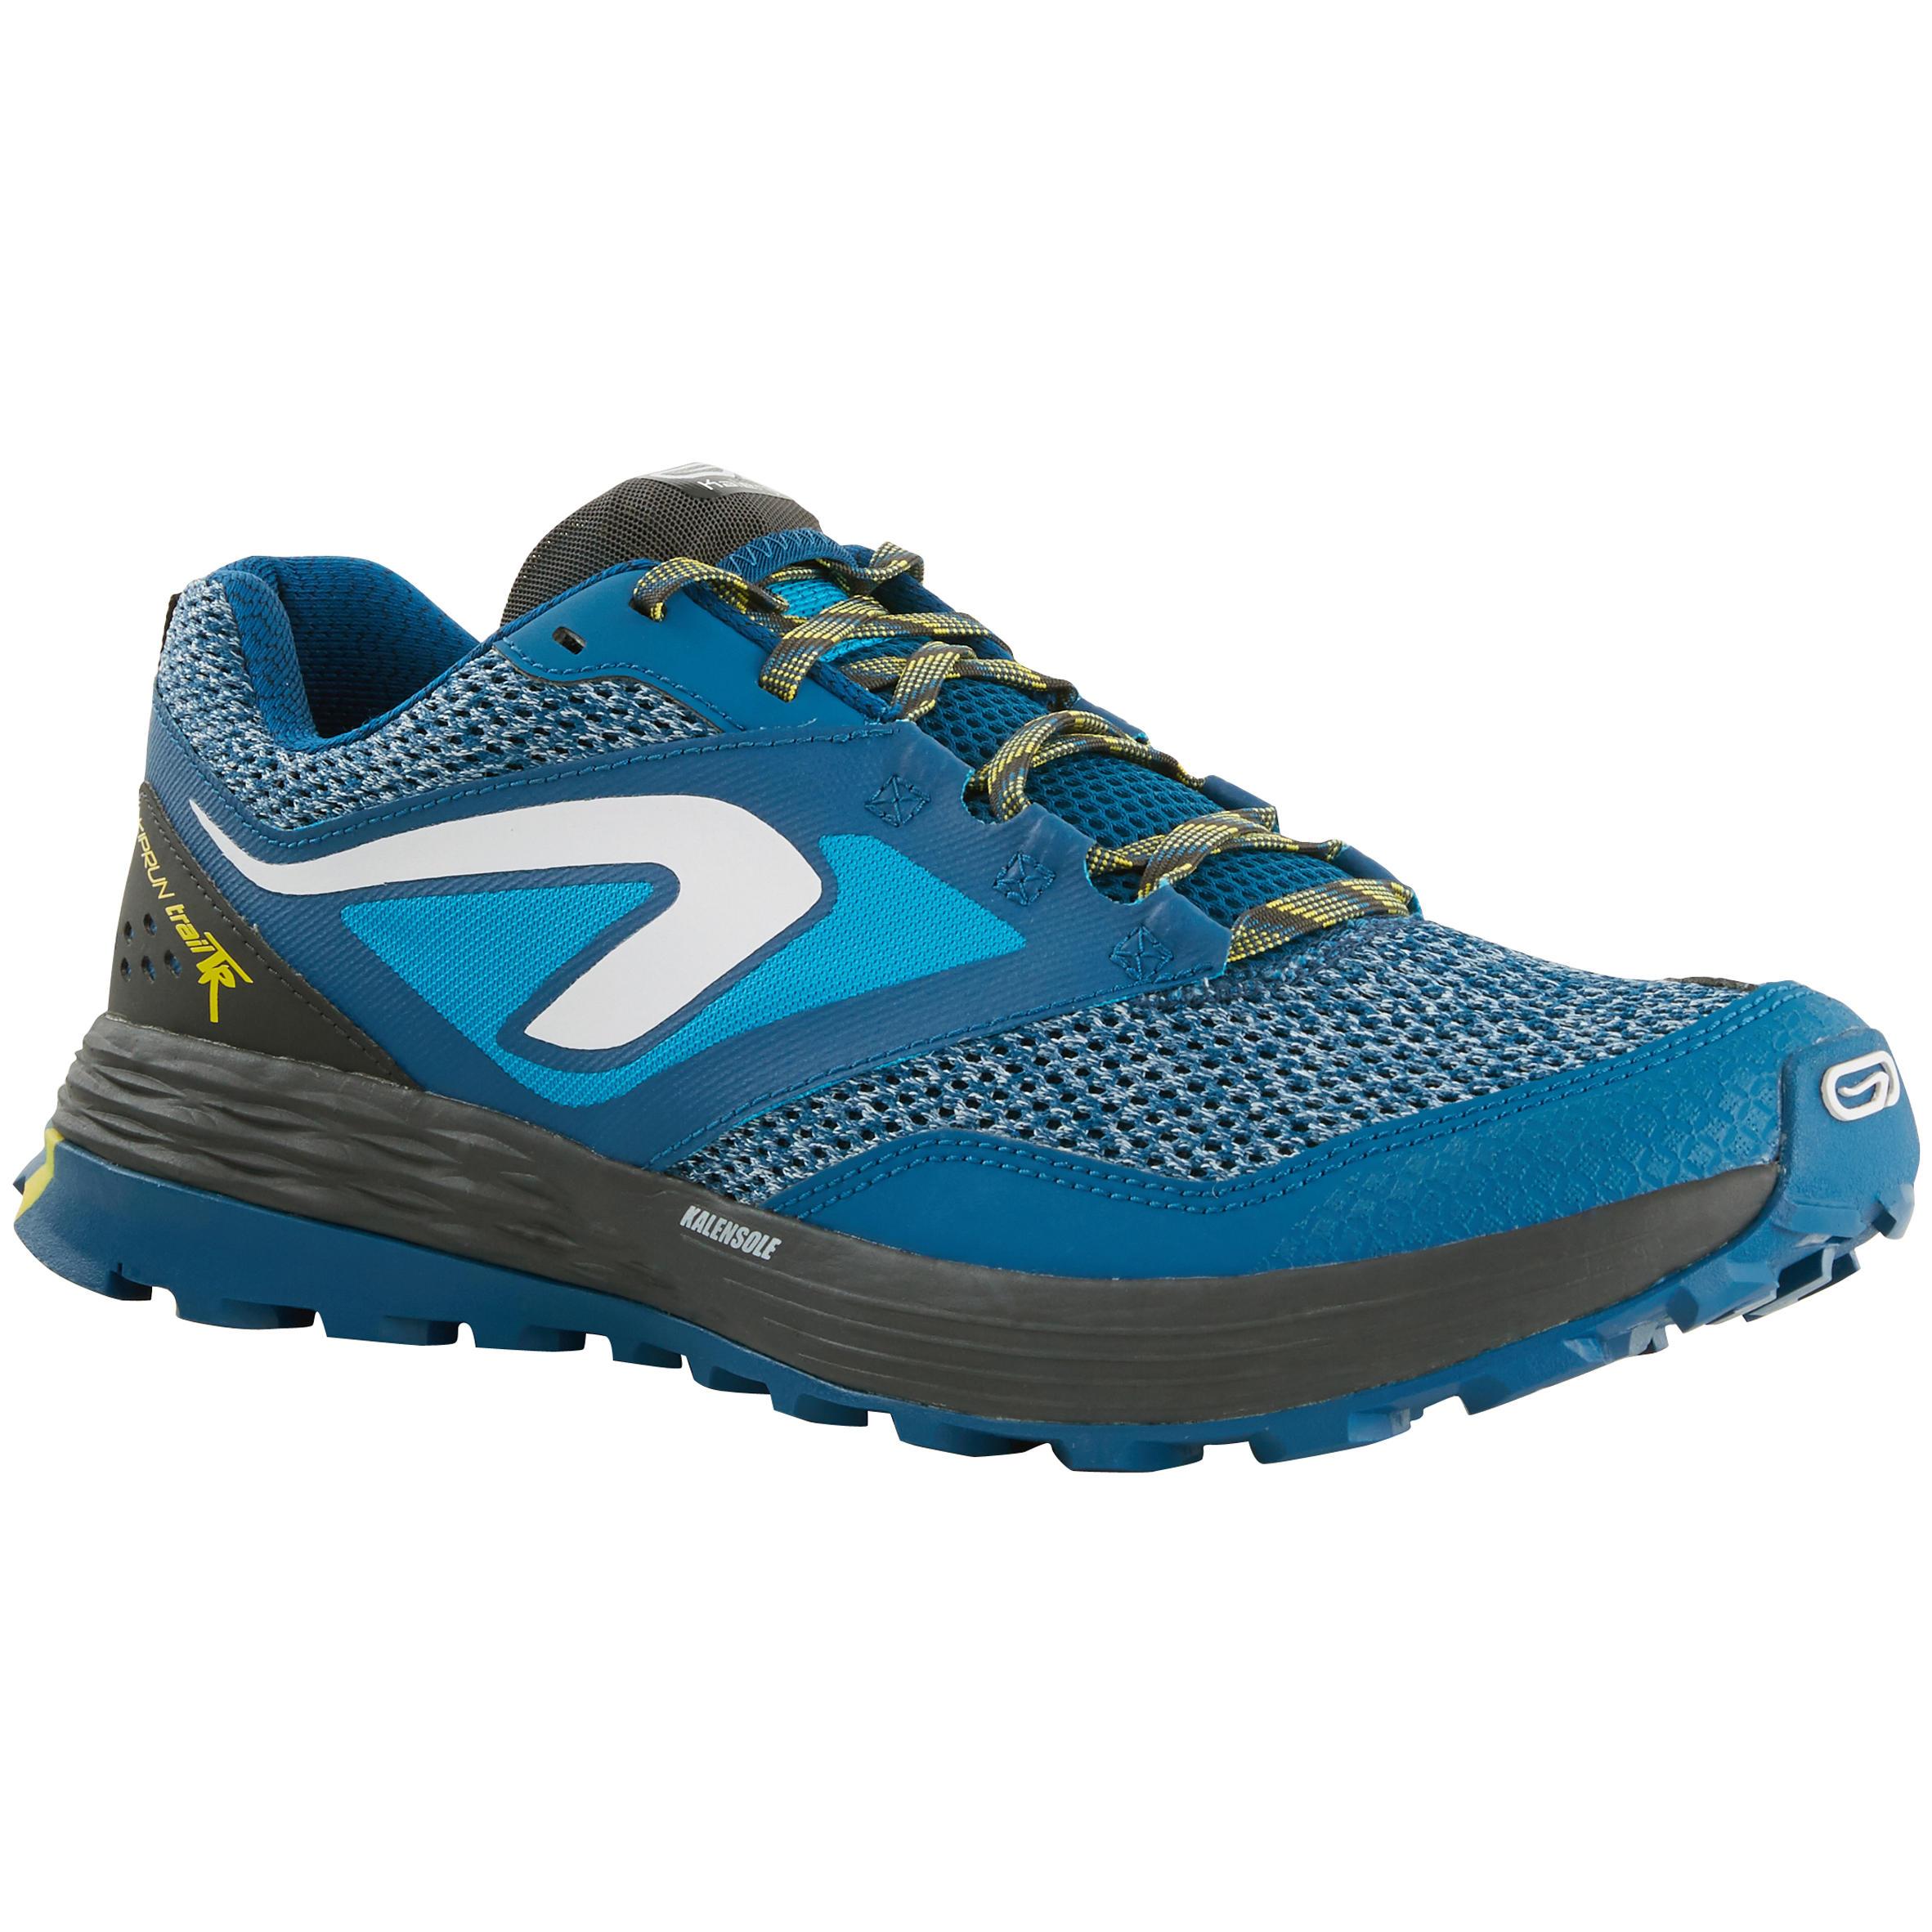 59c5d5a8e Comprar zapatillas de trail running